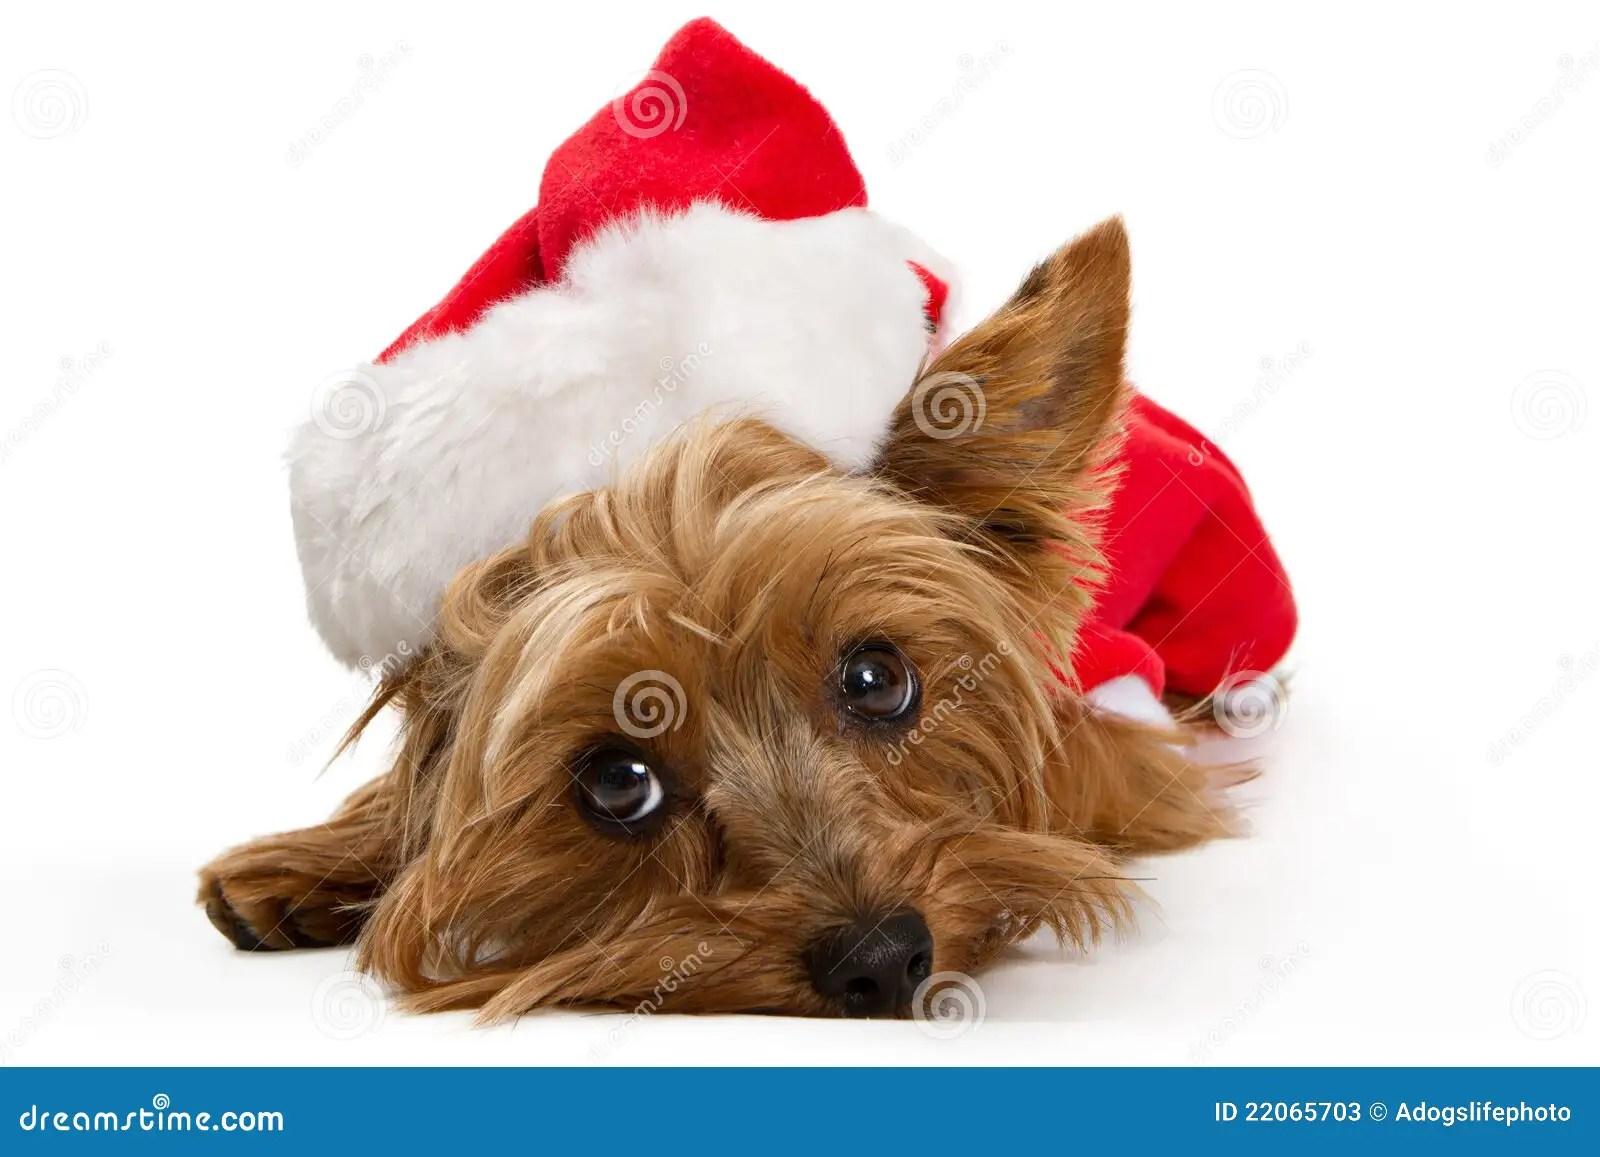 Yorkshire Terrier Dog Wearing Santa Hat Stock Image